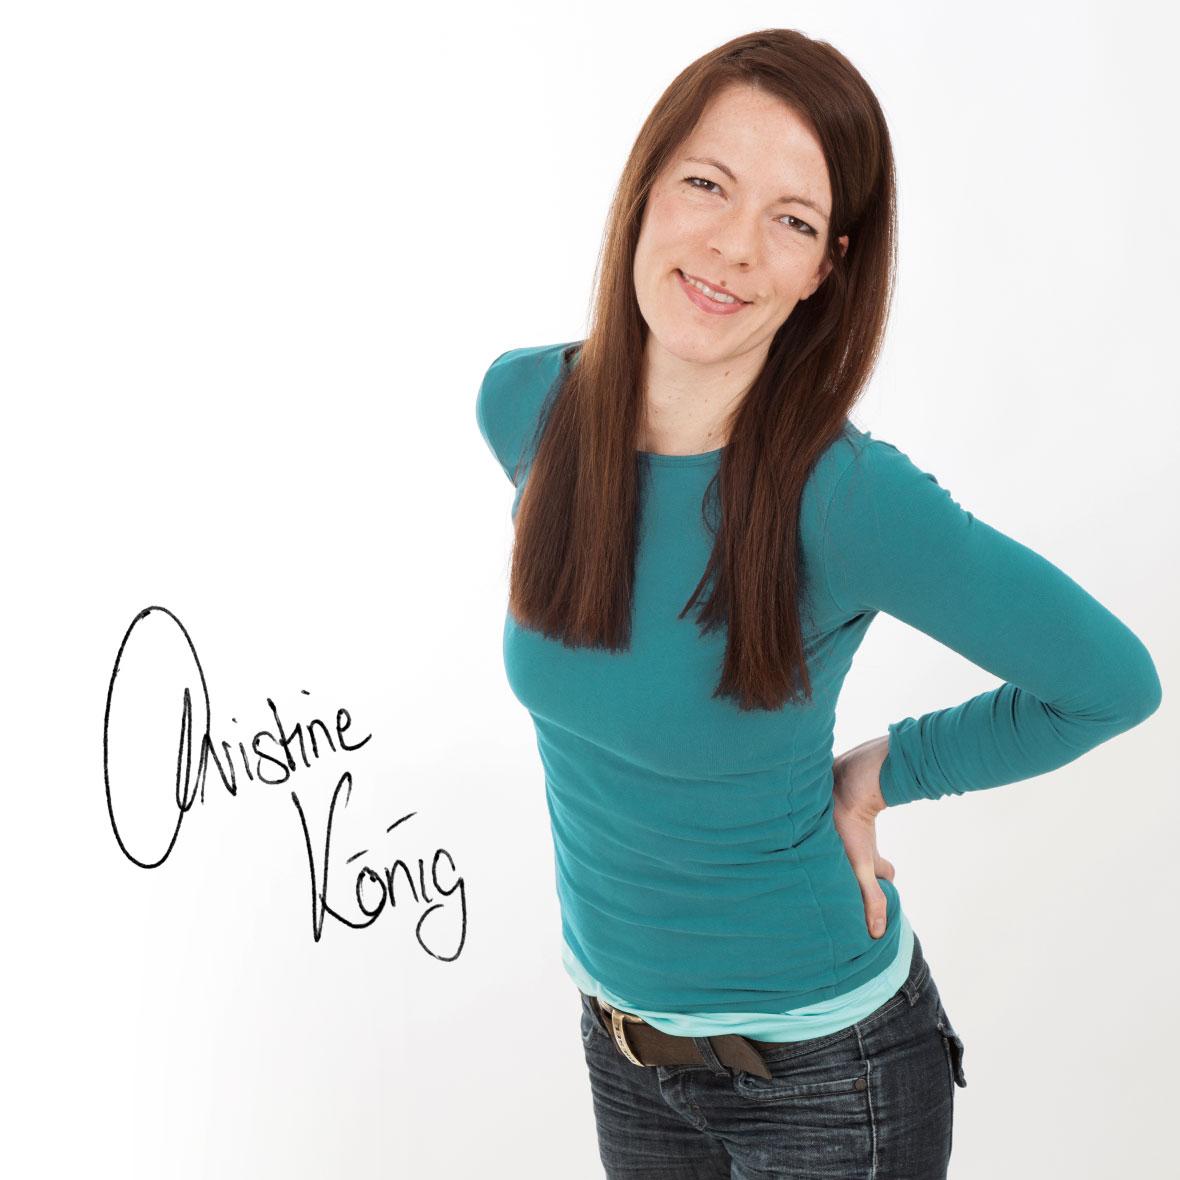 Christine König - Personal Trainer, Signatur - Slider